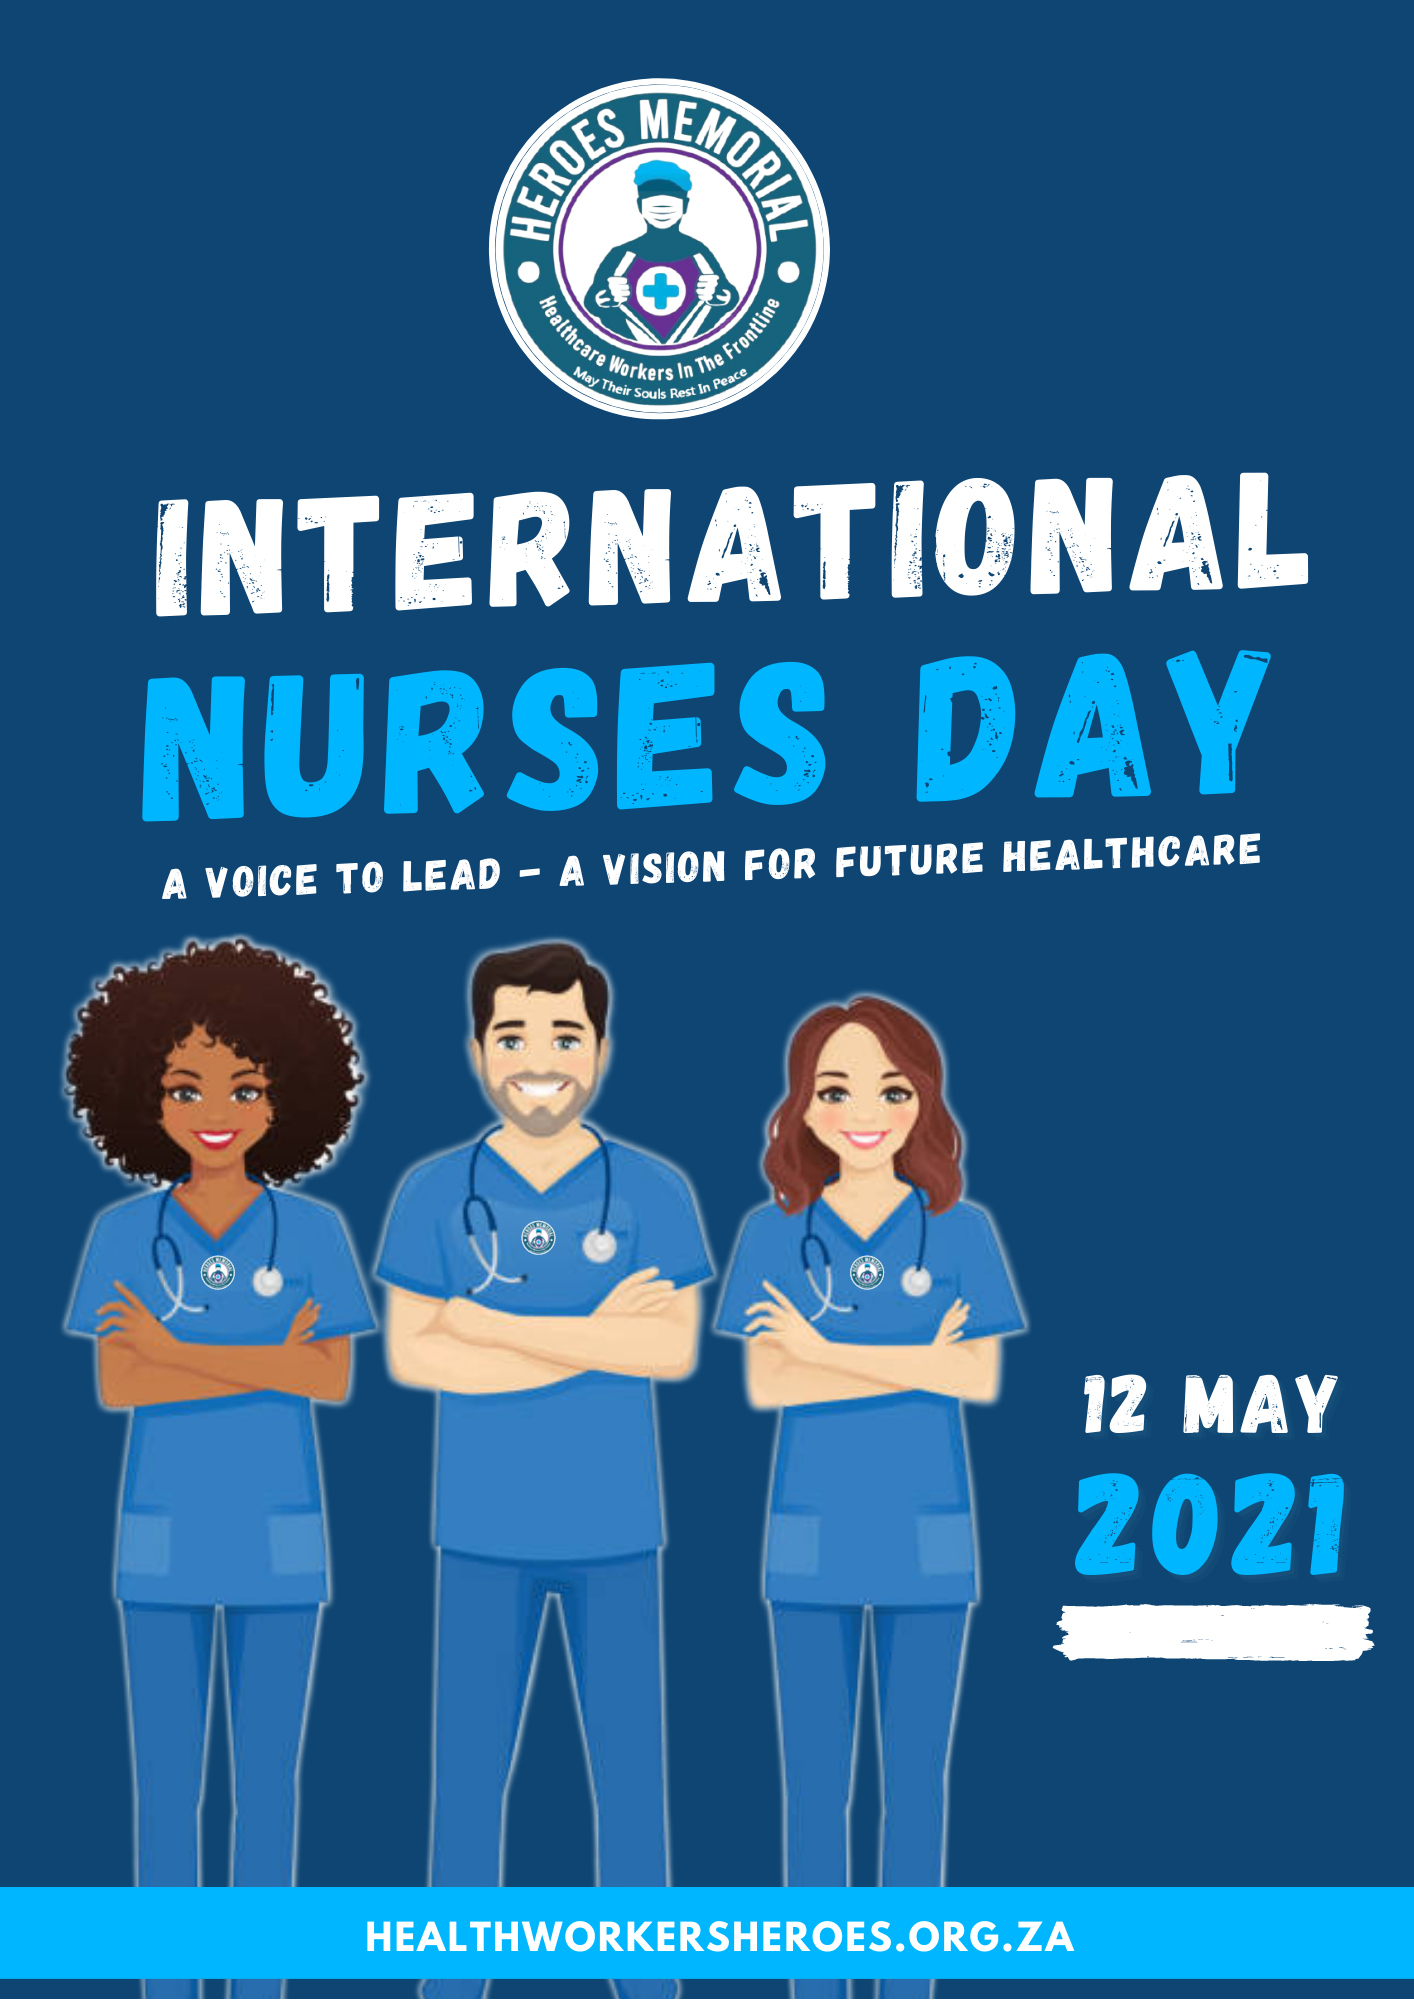 International Nurses Day, 12 May 2021